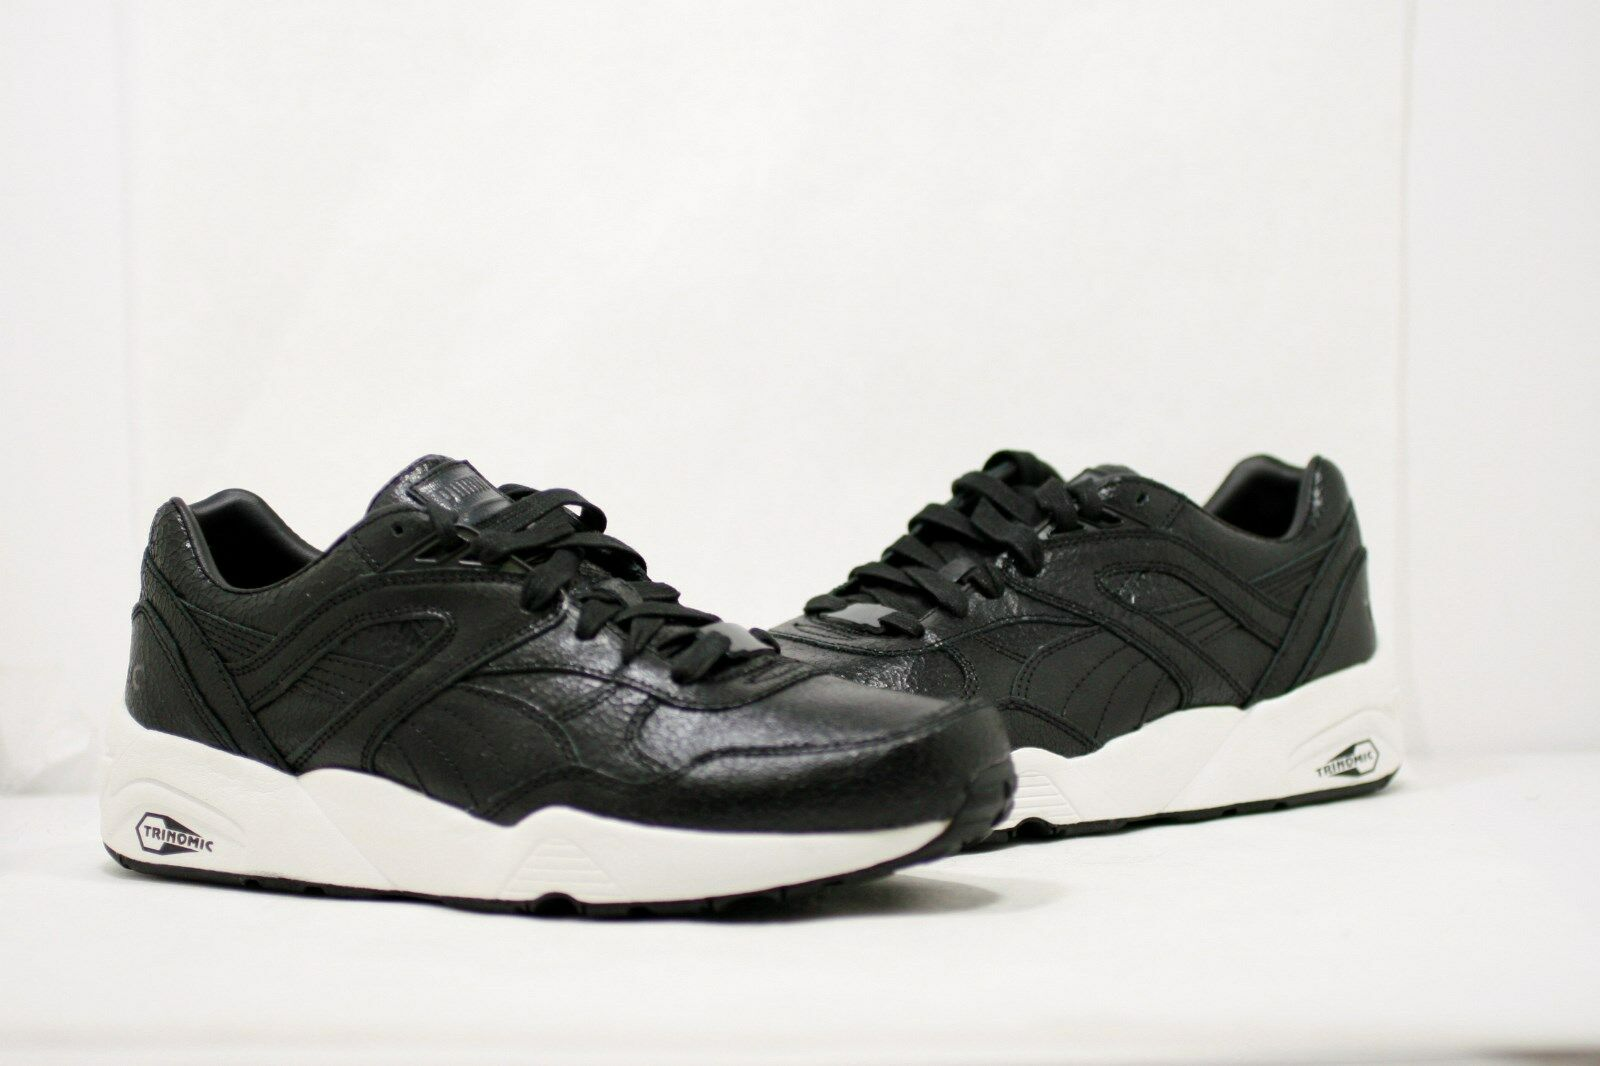 Puma R698 Crackle Black Sneakers 357740-01 Men's Sizes: 10 , 11 , 12